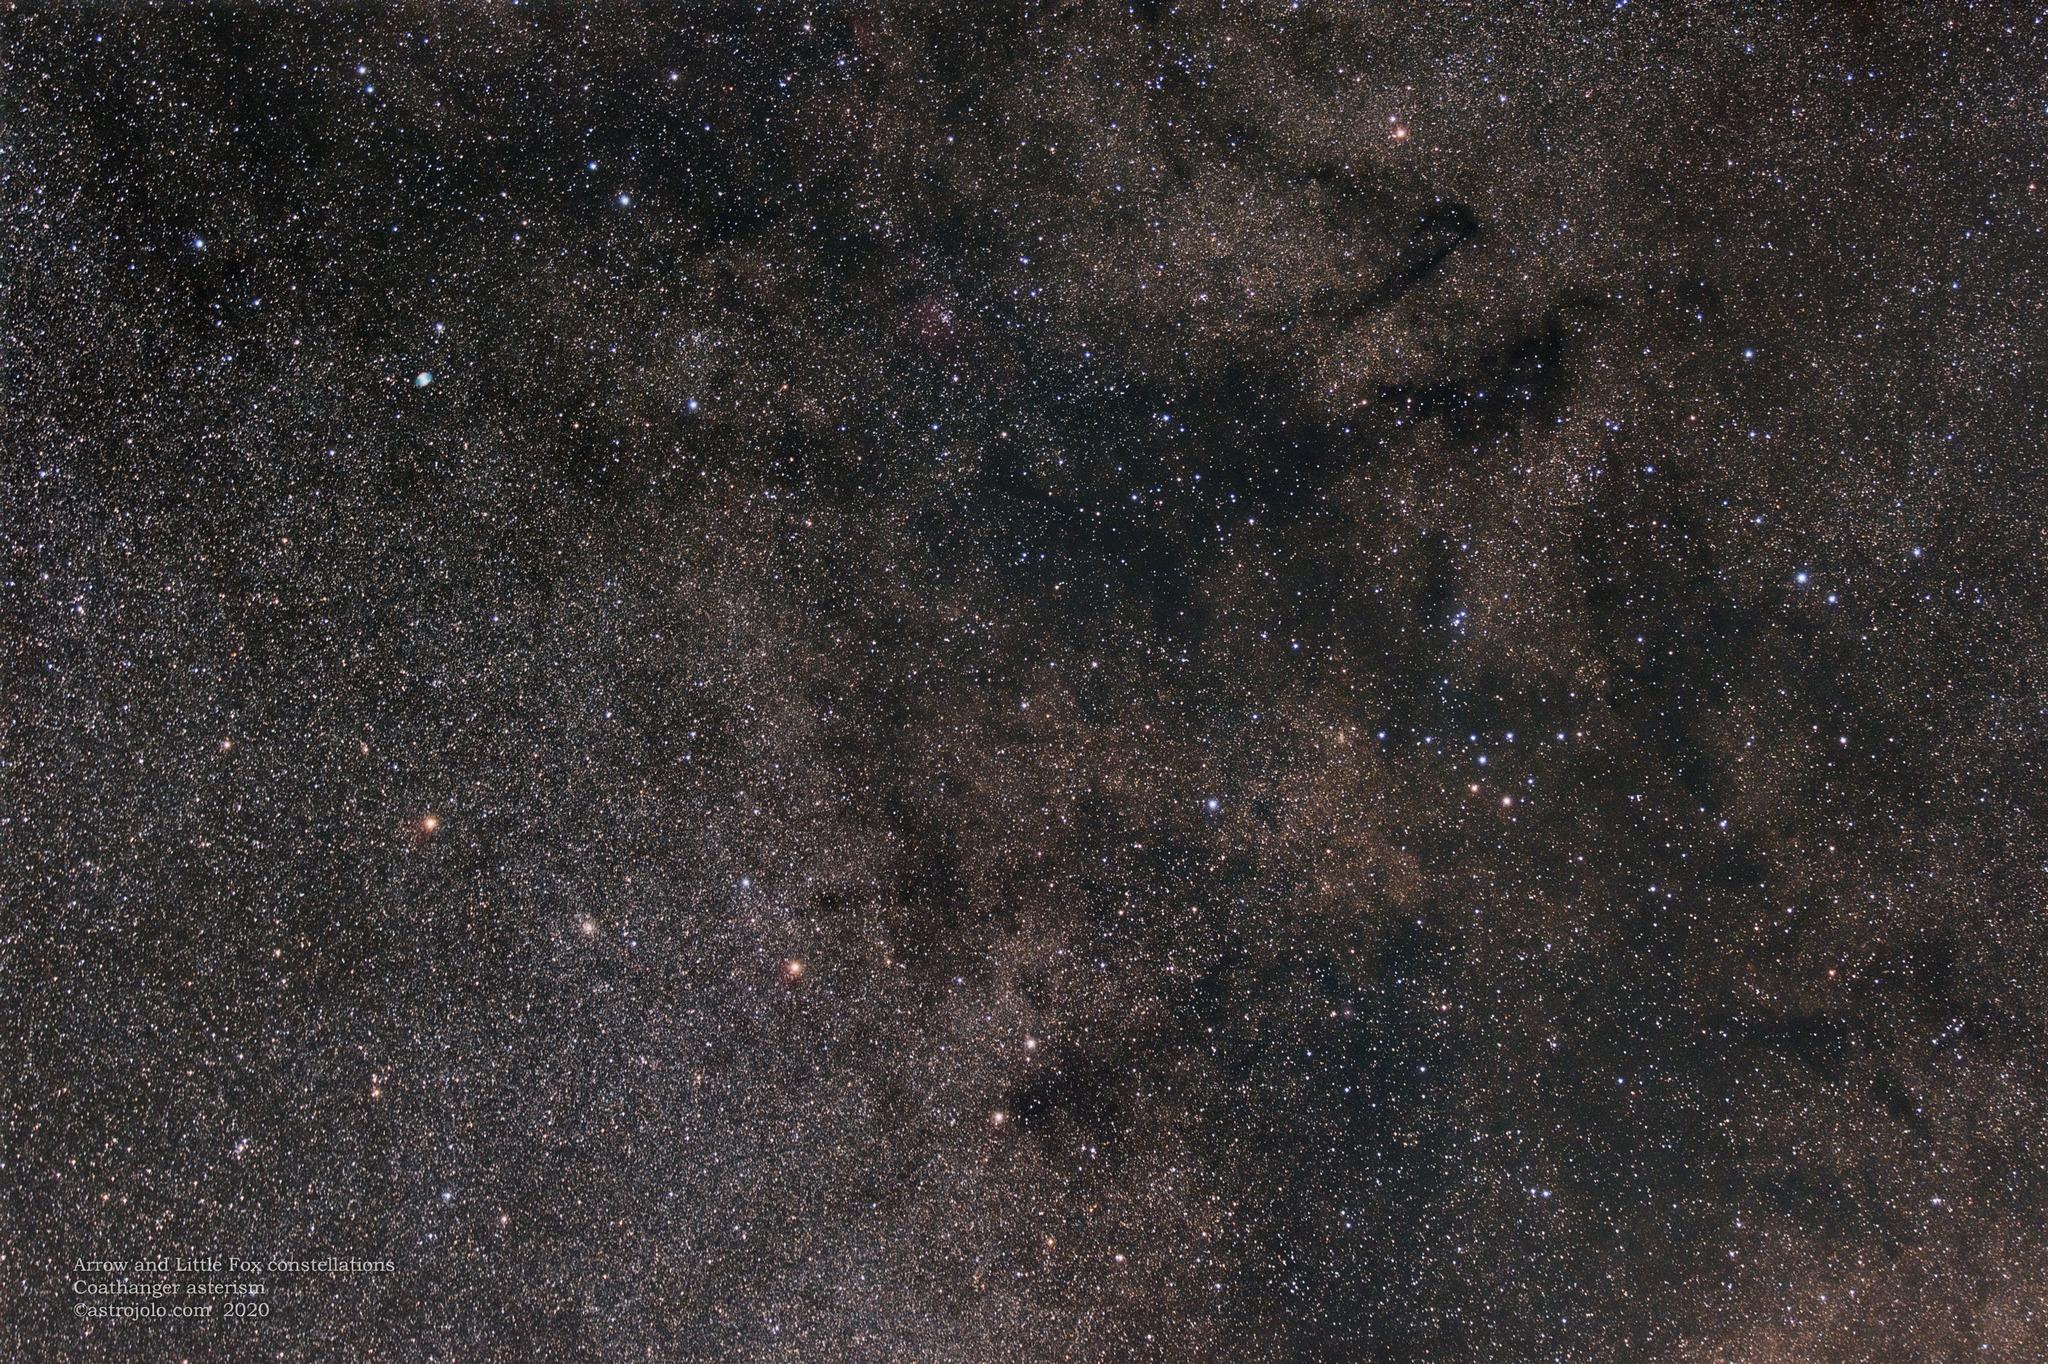 2020-09-10-sagitta-2.jpg